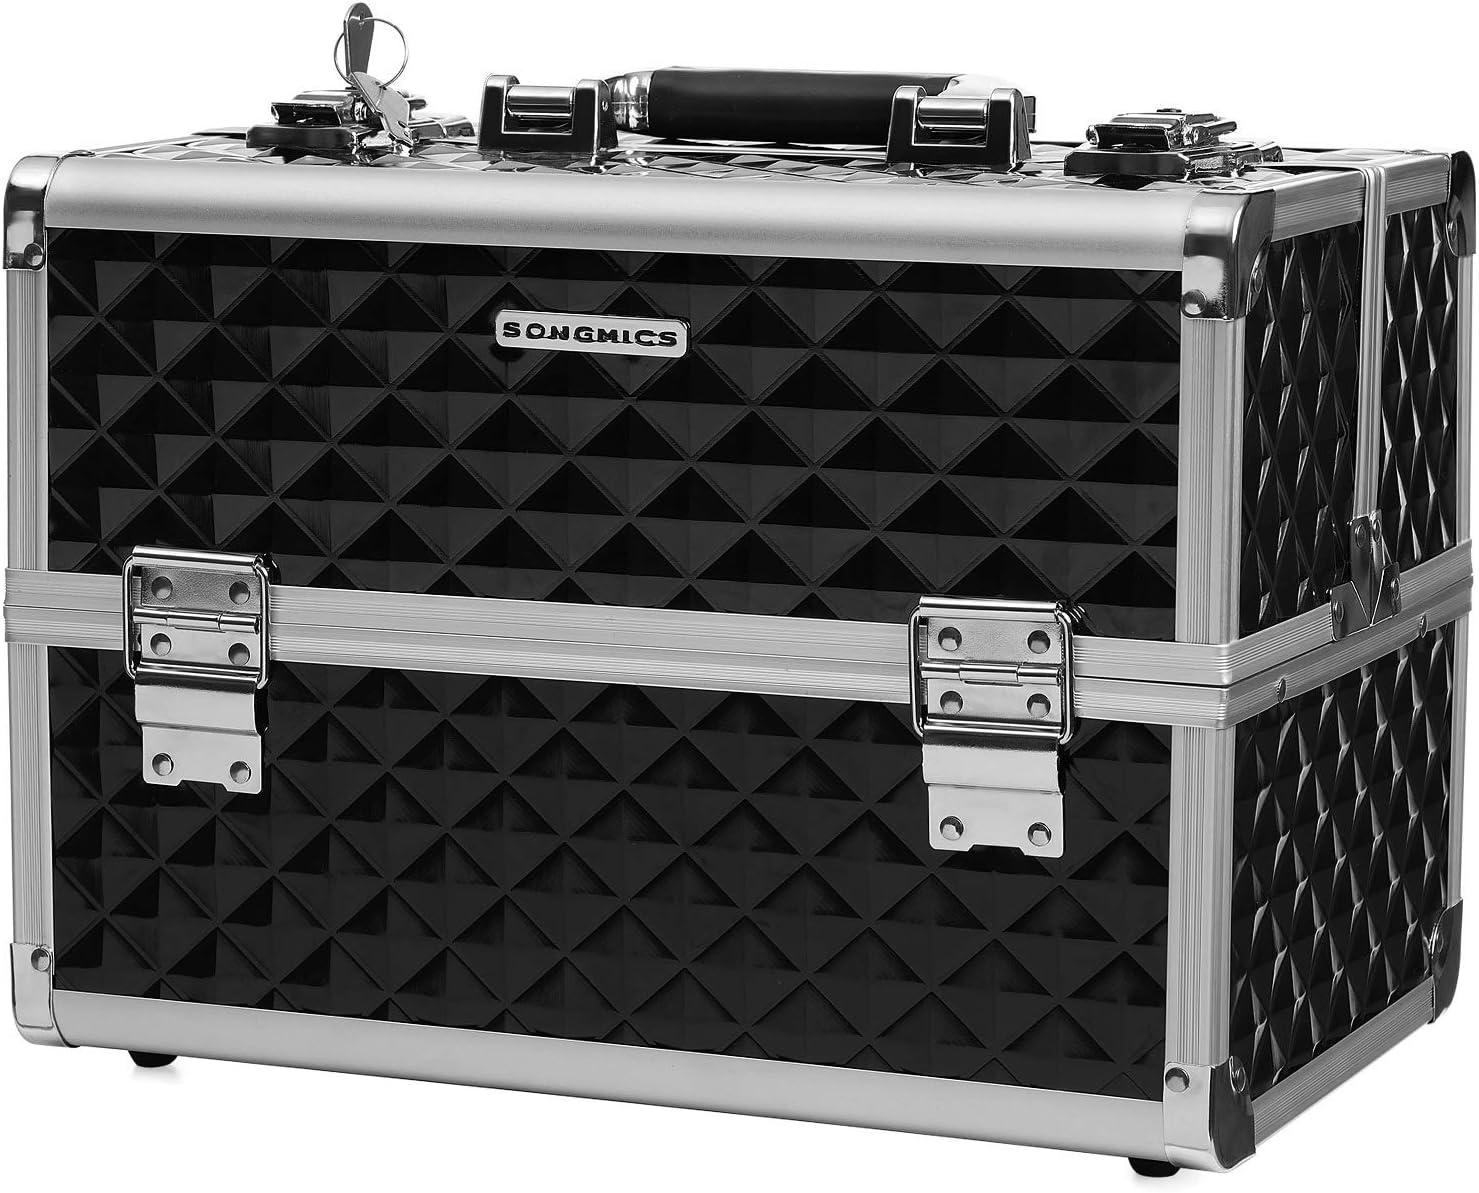 "Songmics 13.5"" Makeup Train Case Professional Cosmetic Box"